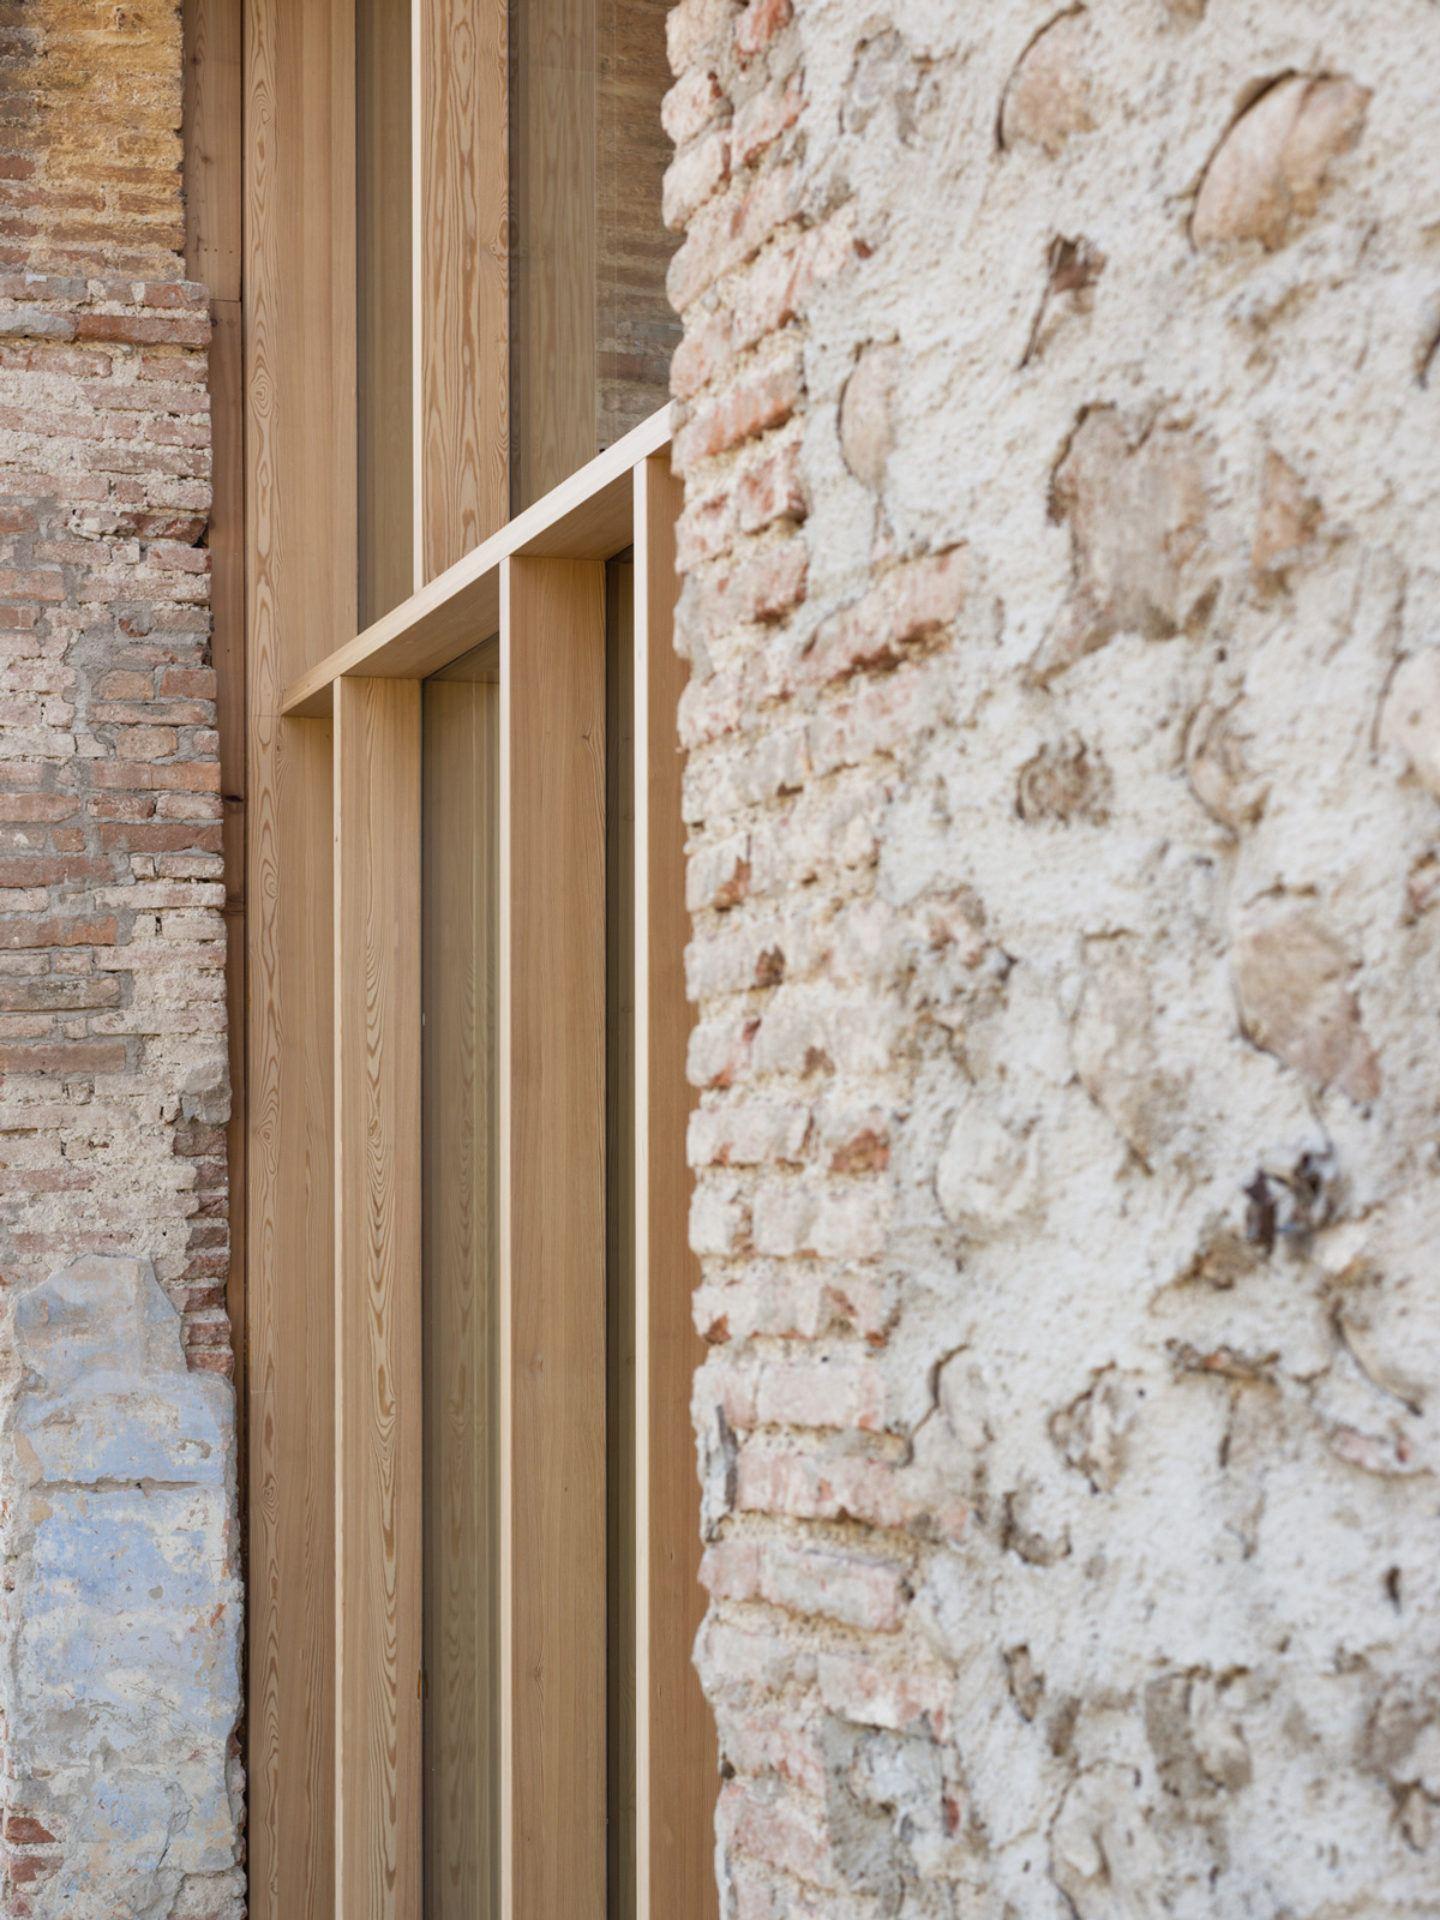 IGNANT-Architecture-Studio-Wok-Country-Home-In-Chievo-8